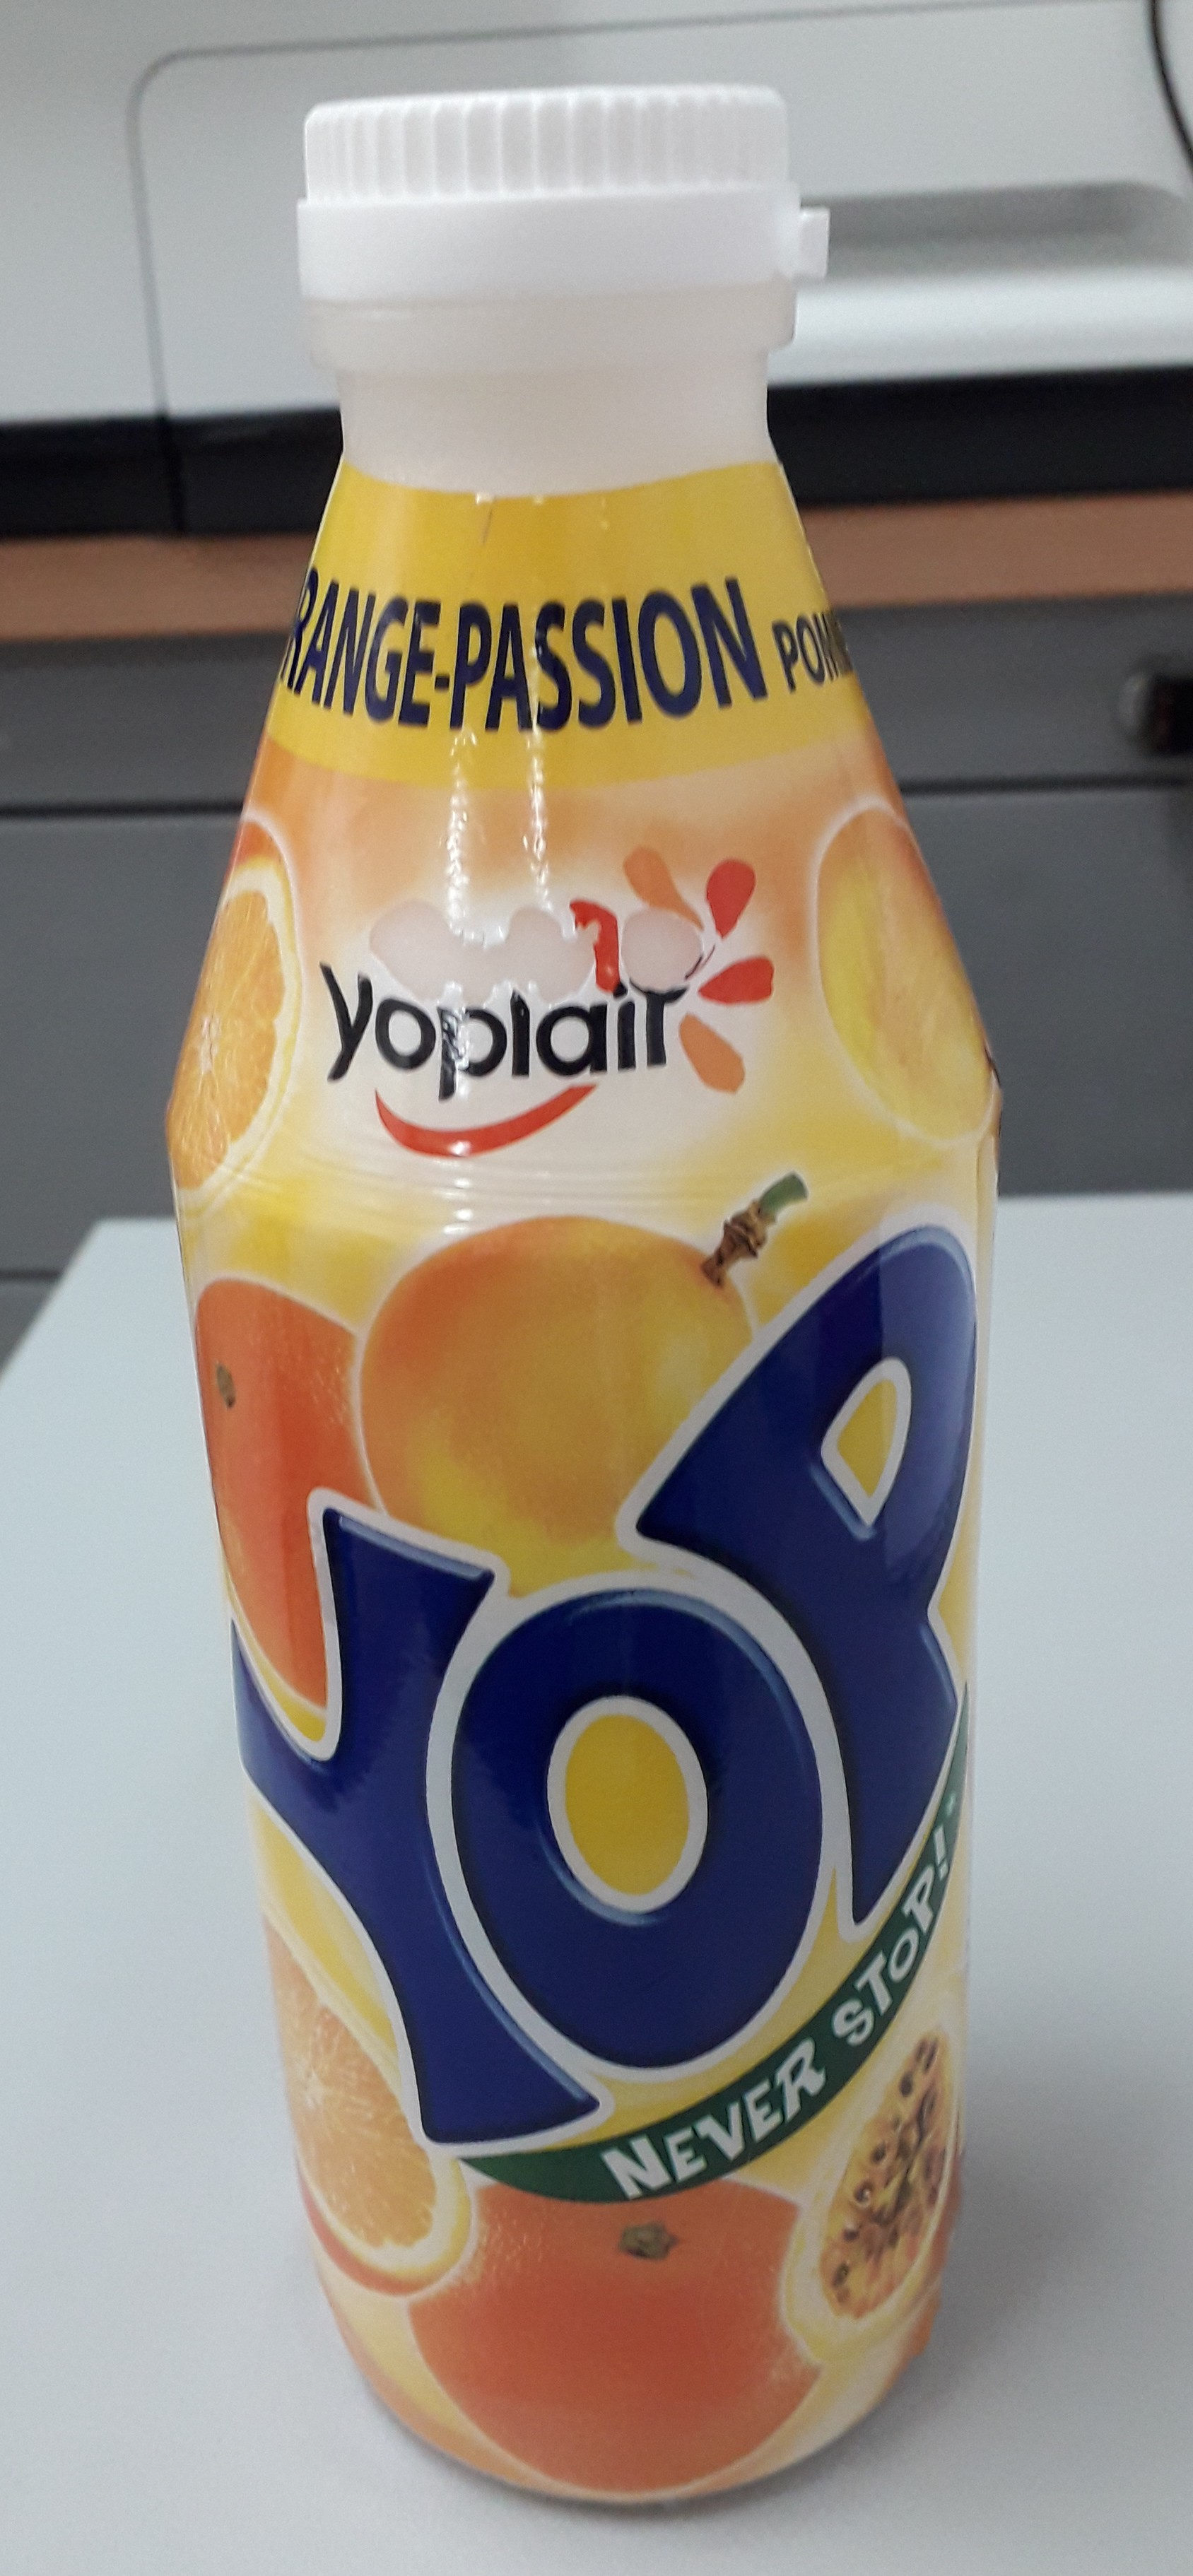 Yop orange passion - Produit - fr